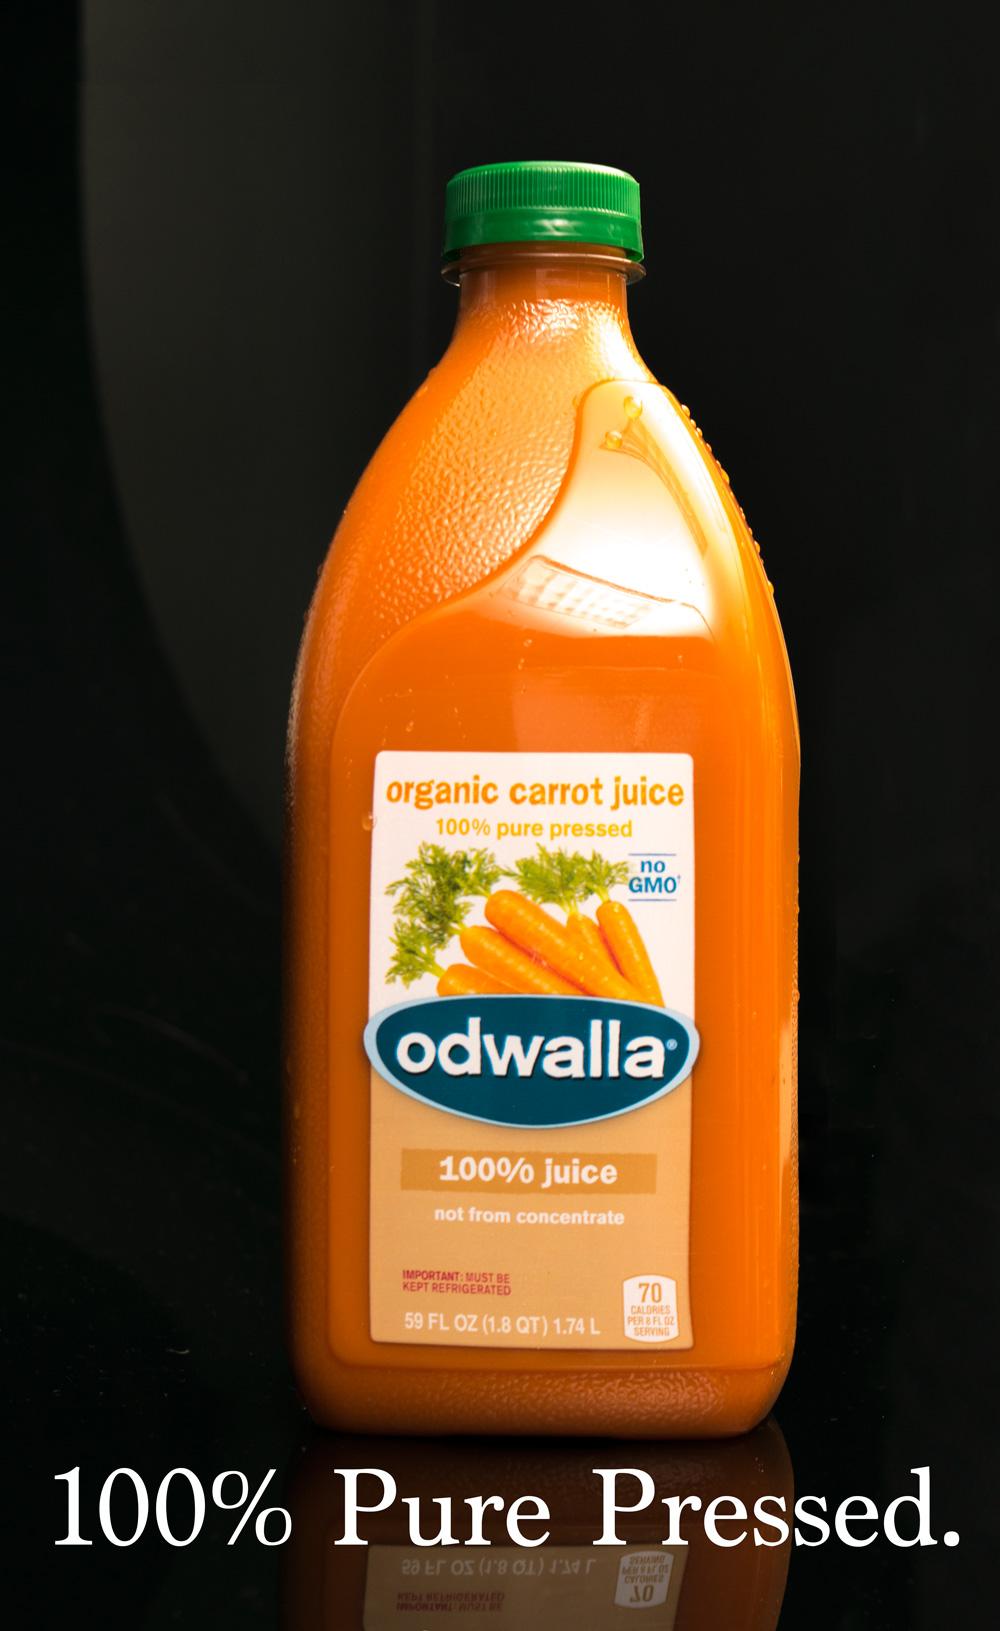 Odwalla Magazine Ad